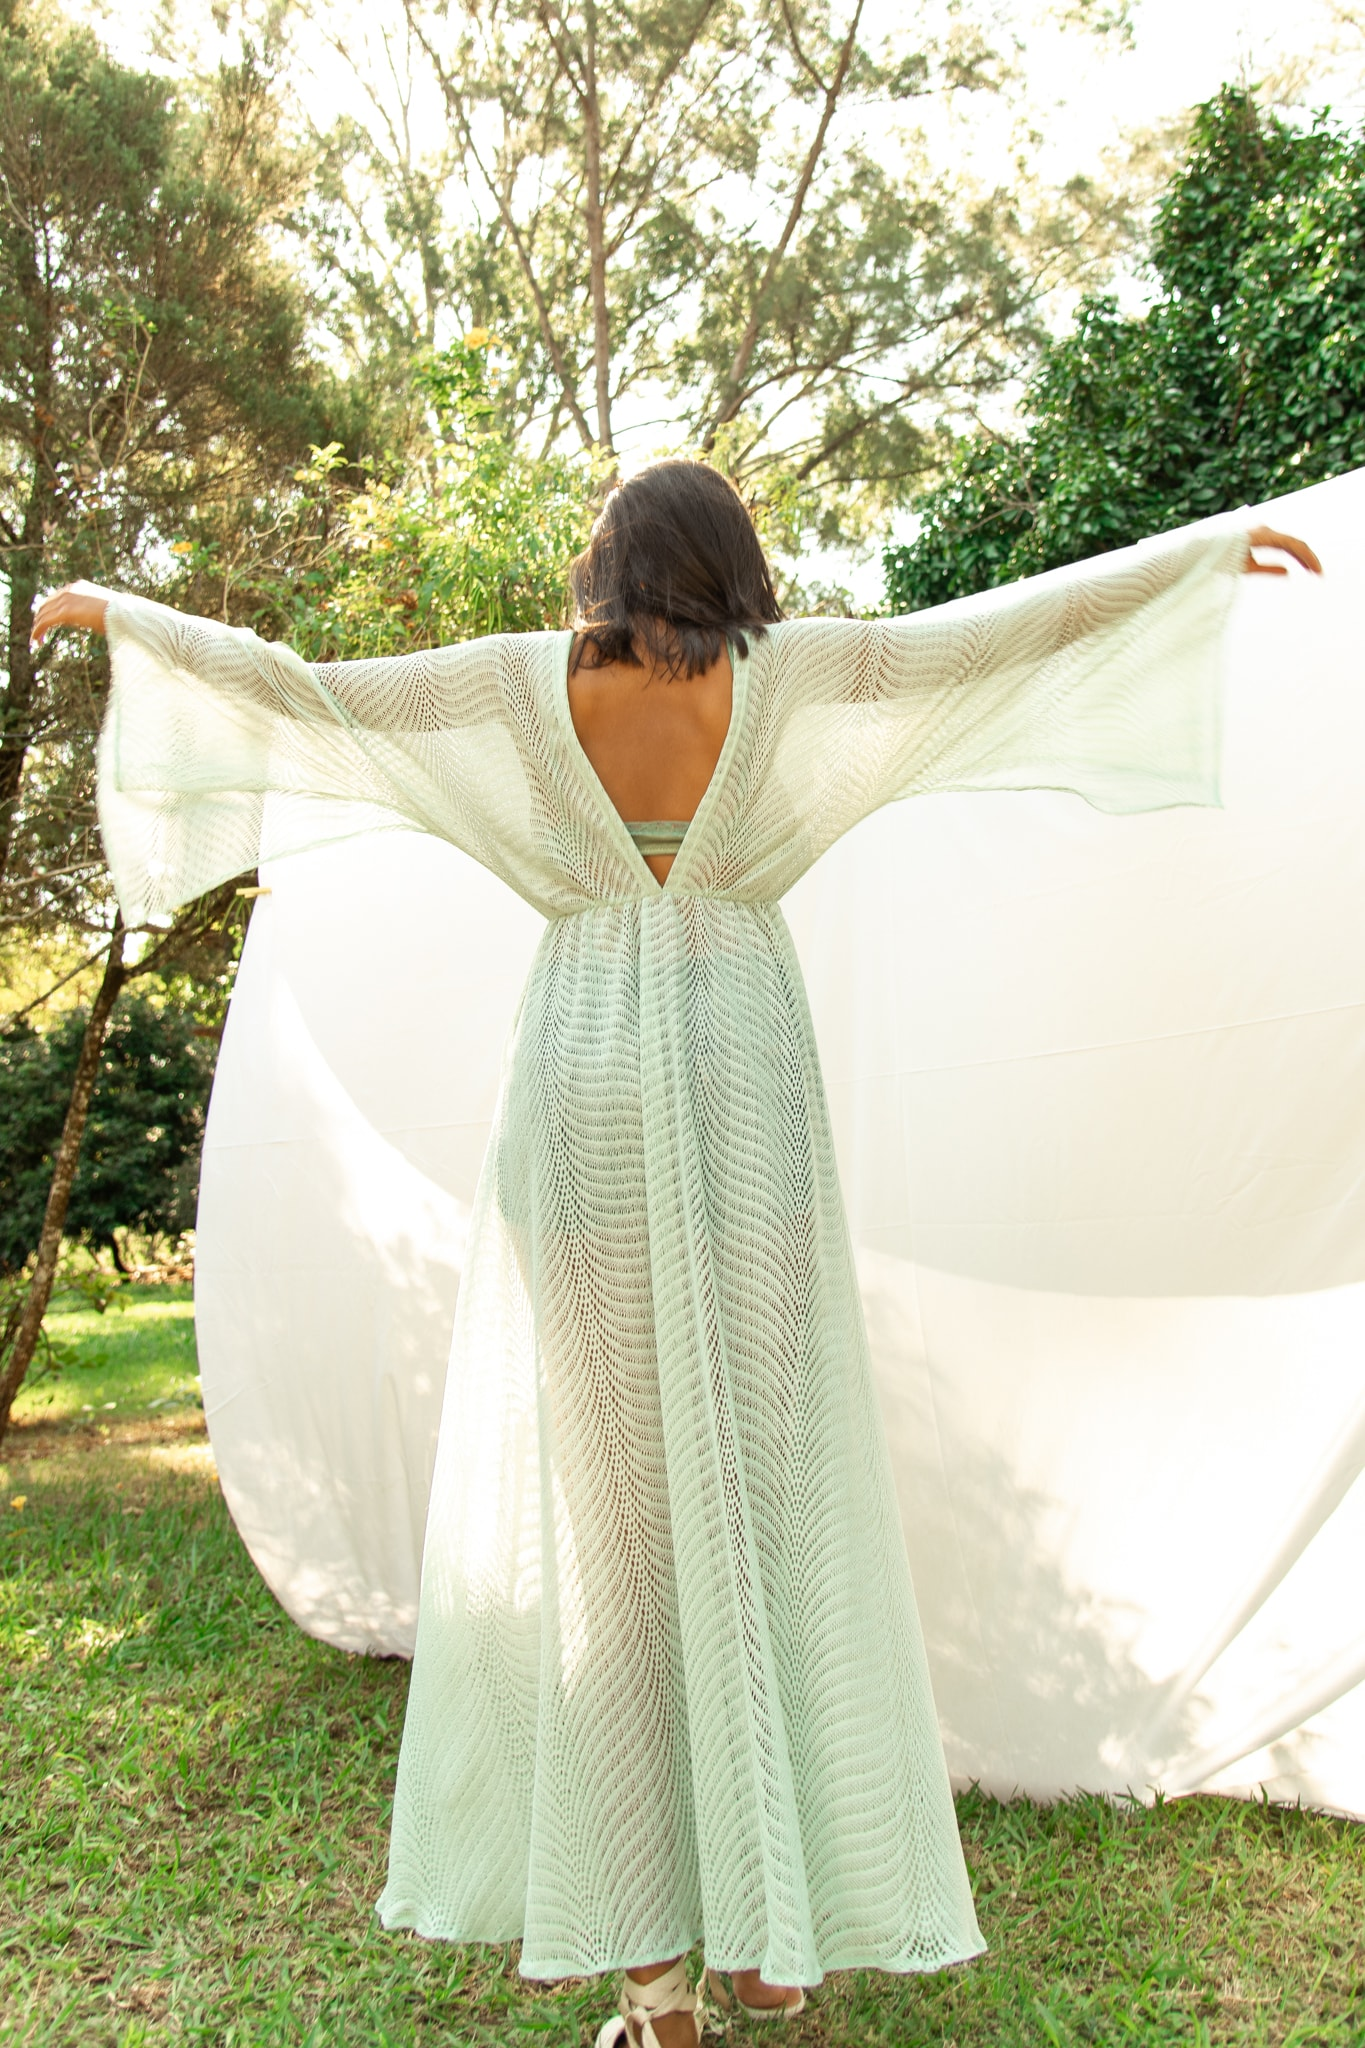 Vestido solto transparente